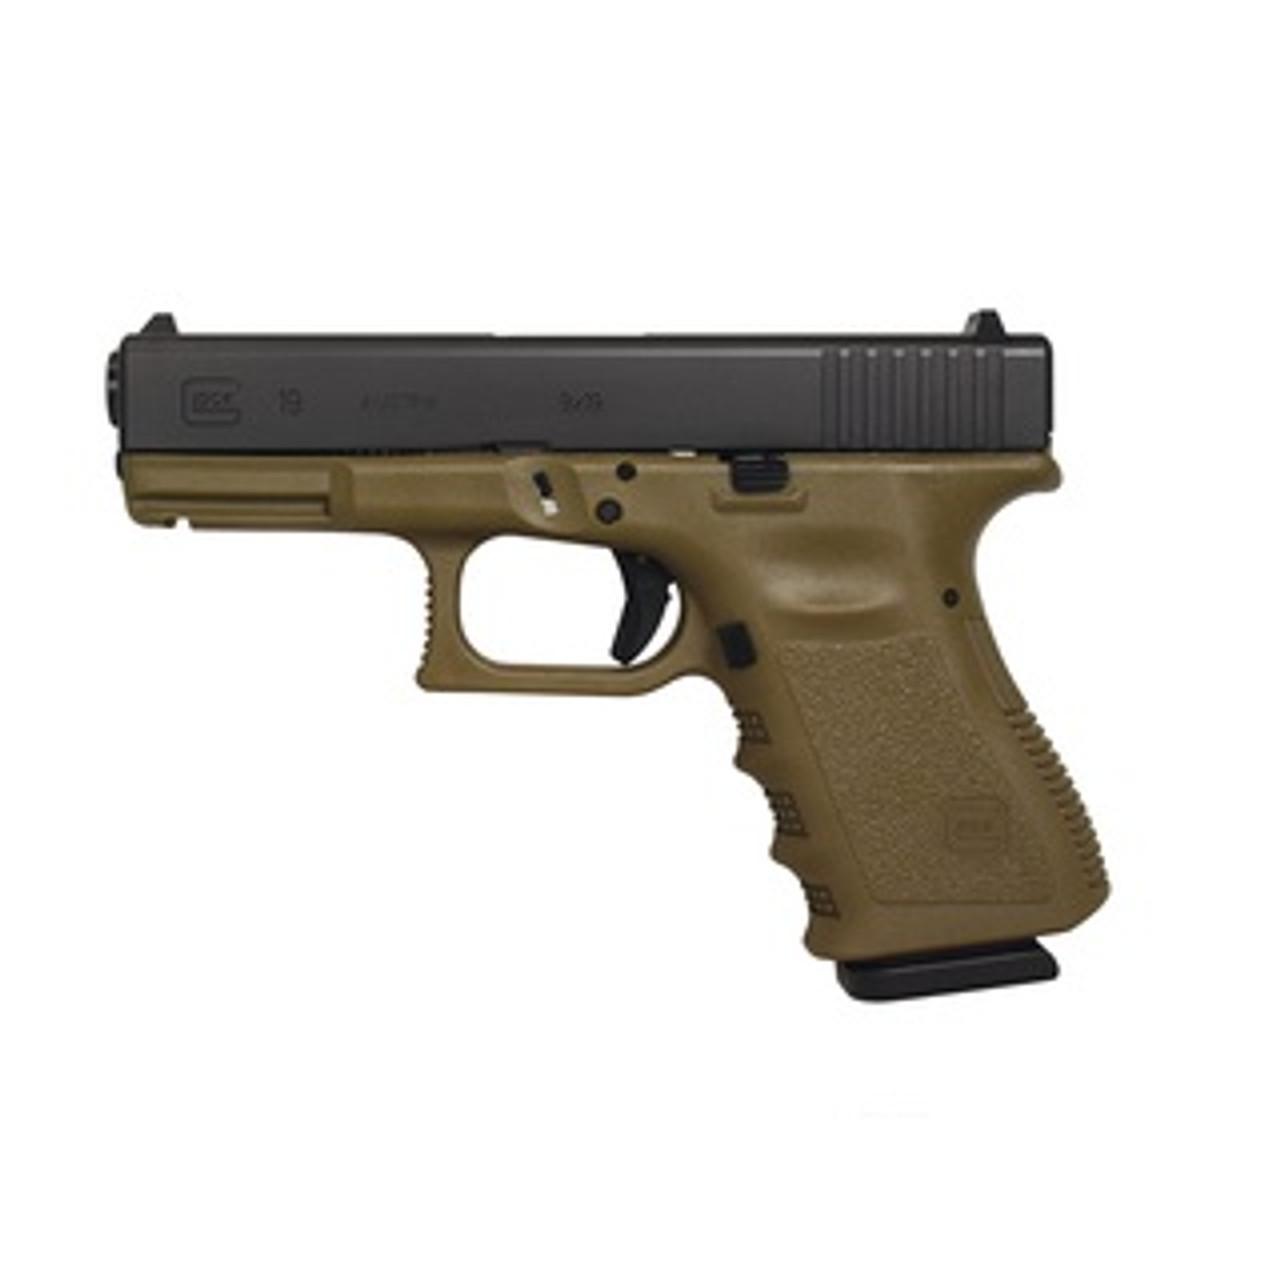 Glock 19 OD Green Gen3  CALIFORNIA LEGAL - 9mm